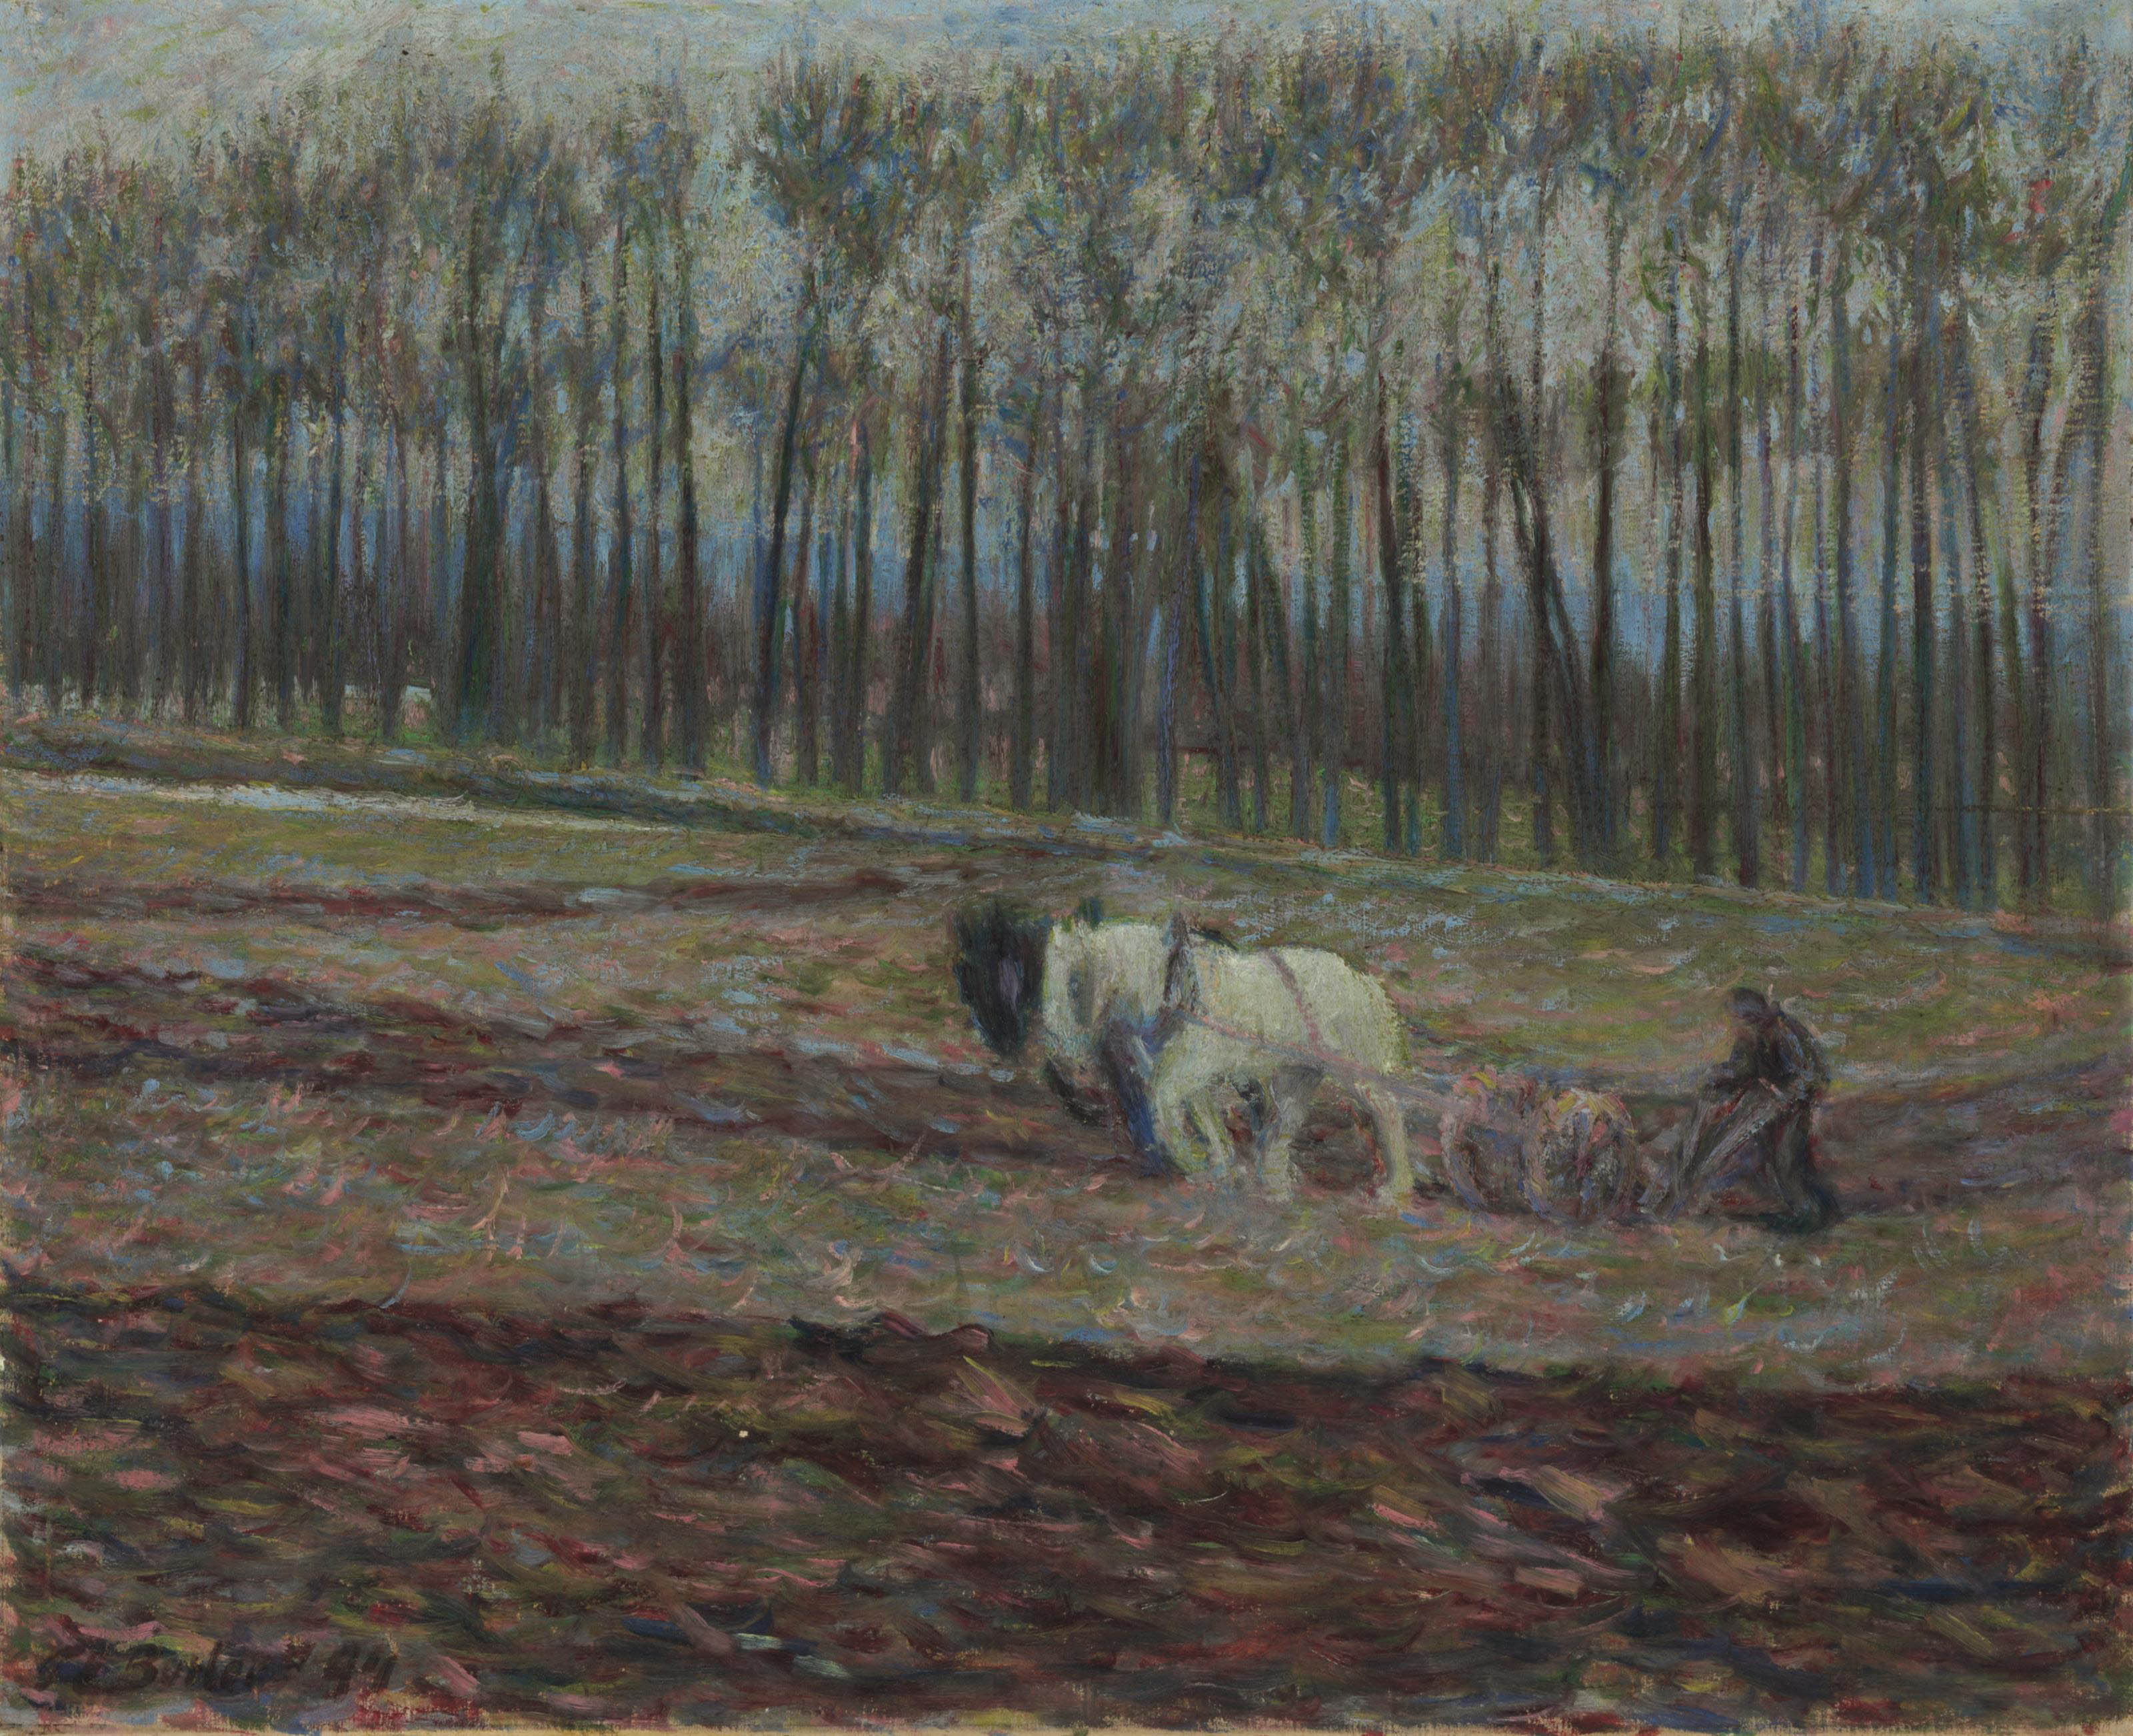 A Tiller of the Soil